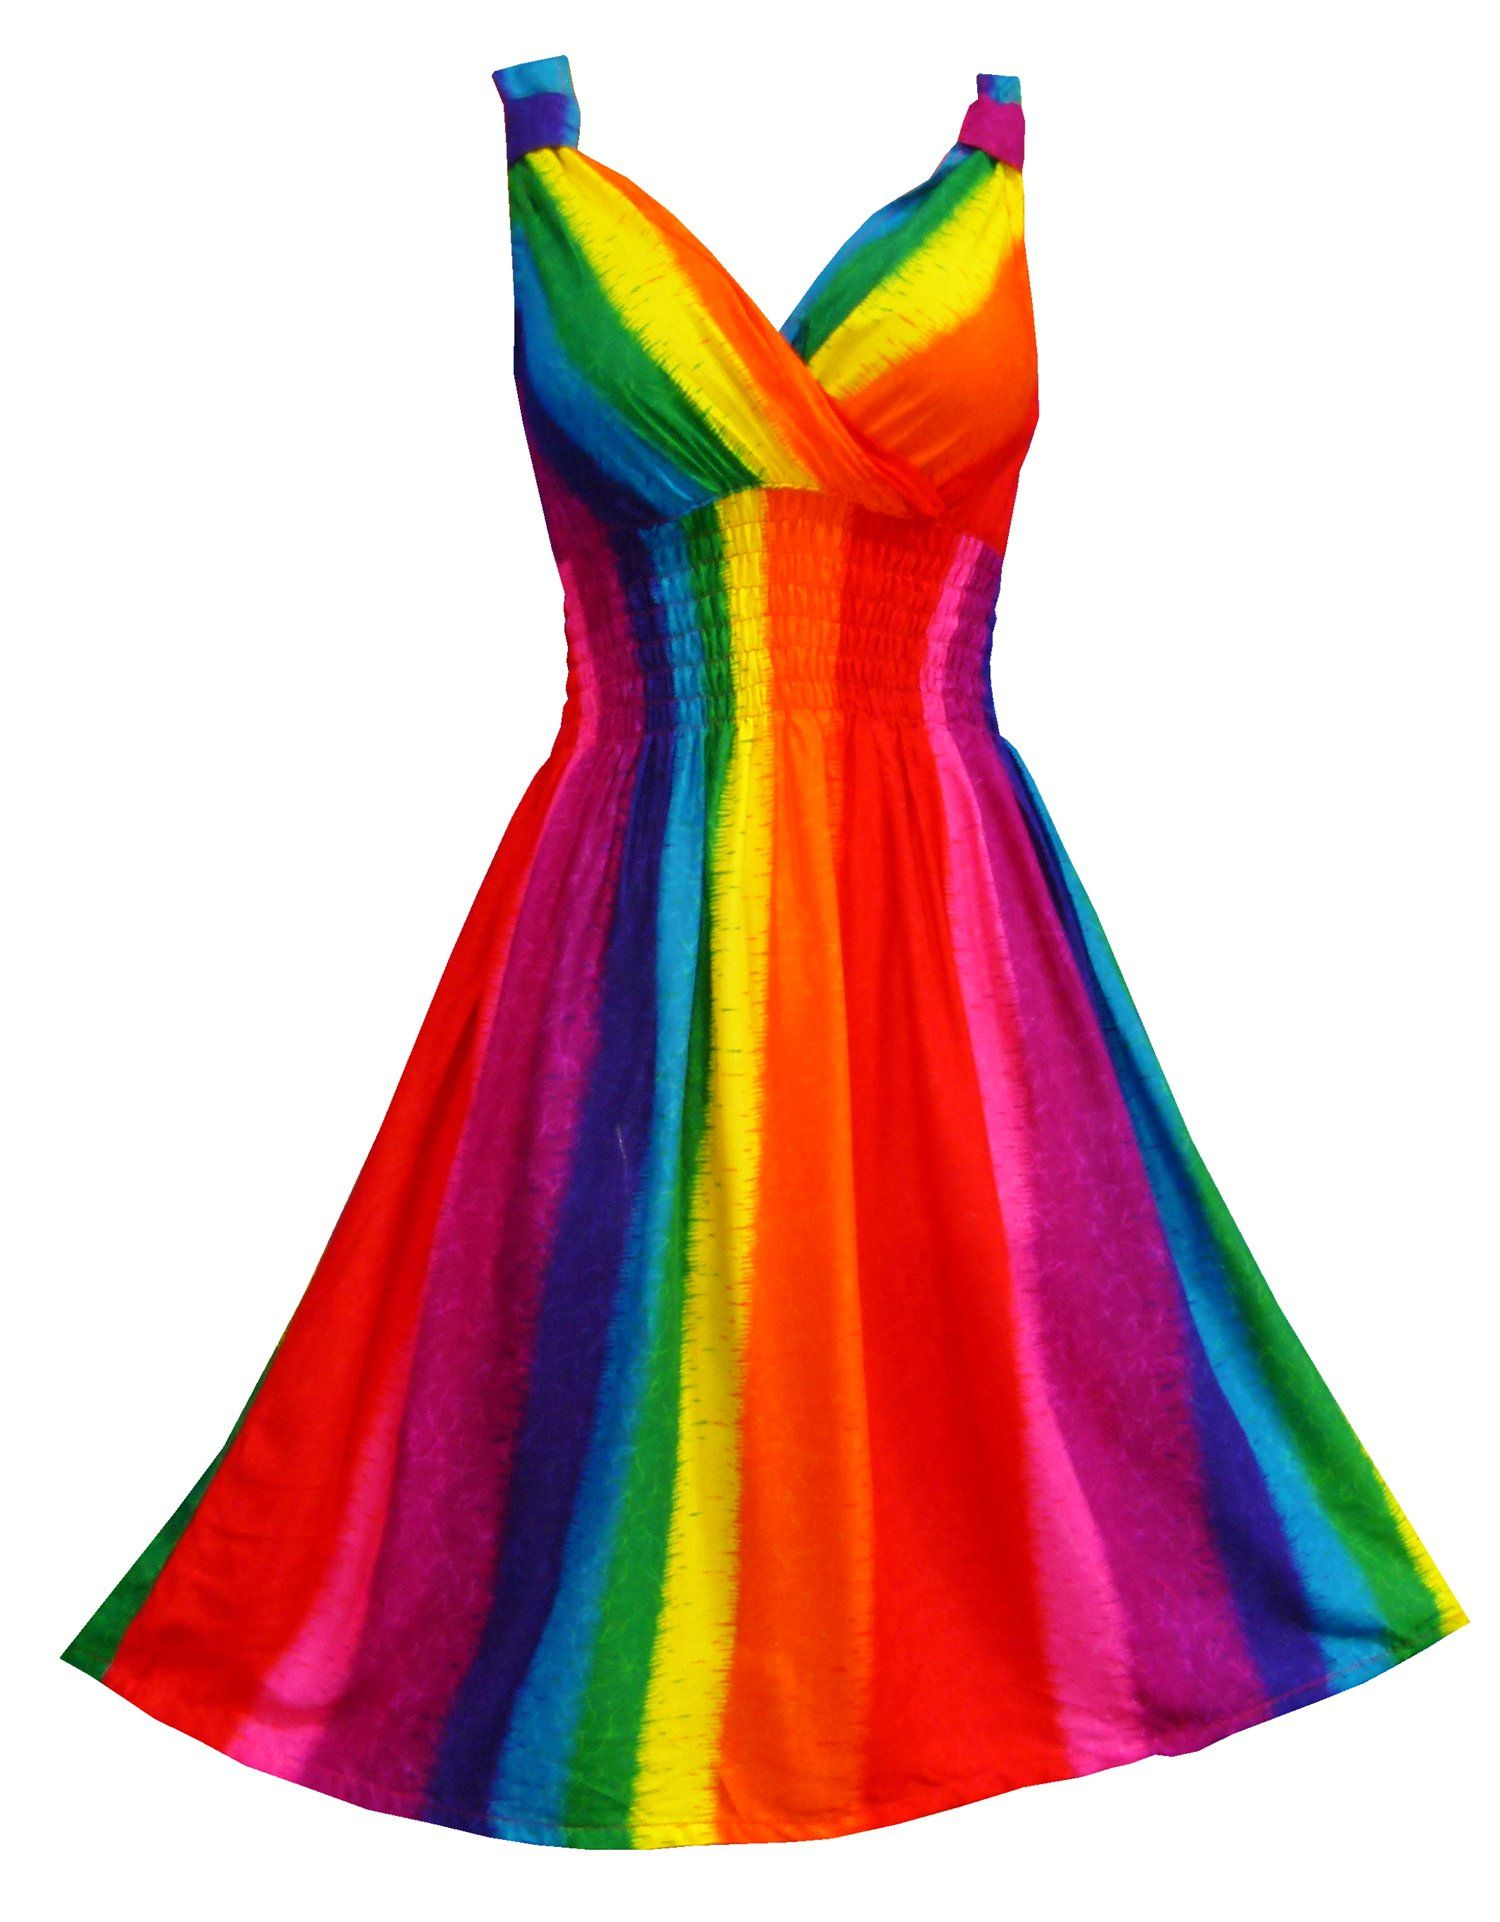 6503c753a4 Lady Rainicorn Costume Idea: Pikulla V-Neck Sleeveless Women's Rainbow  Gypsy Sundress Multicoloured One Size SM | Amazon.com